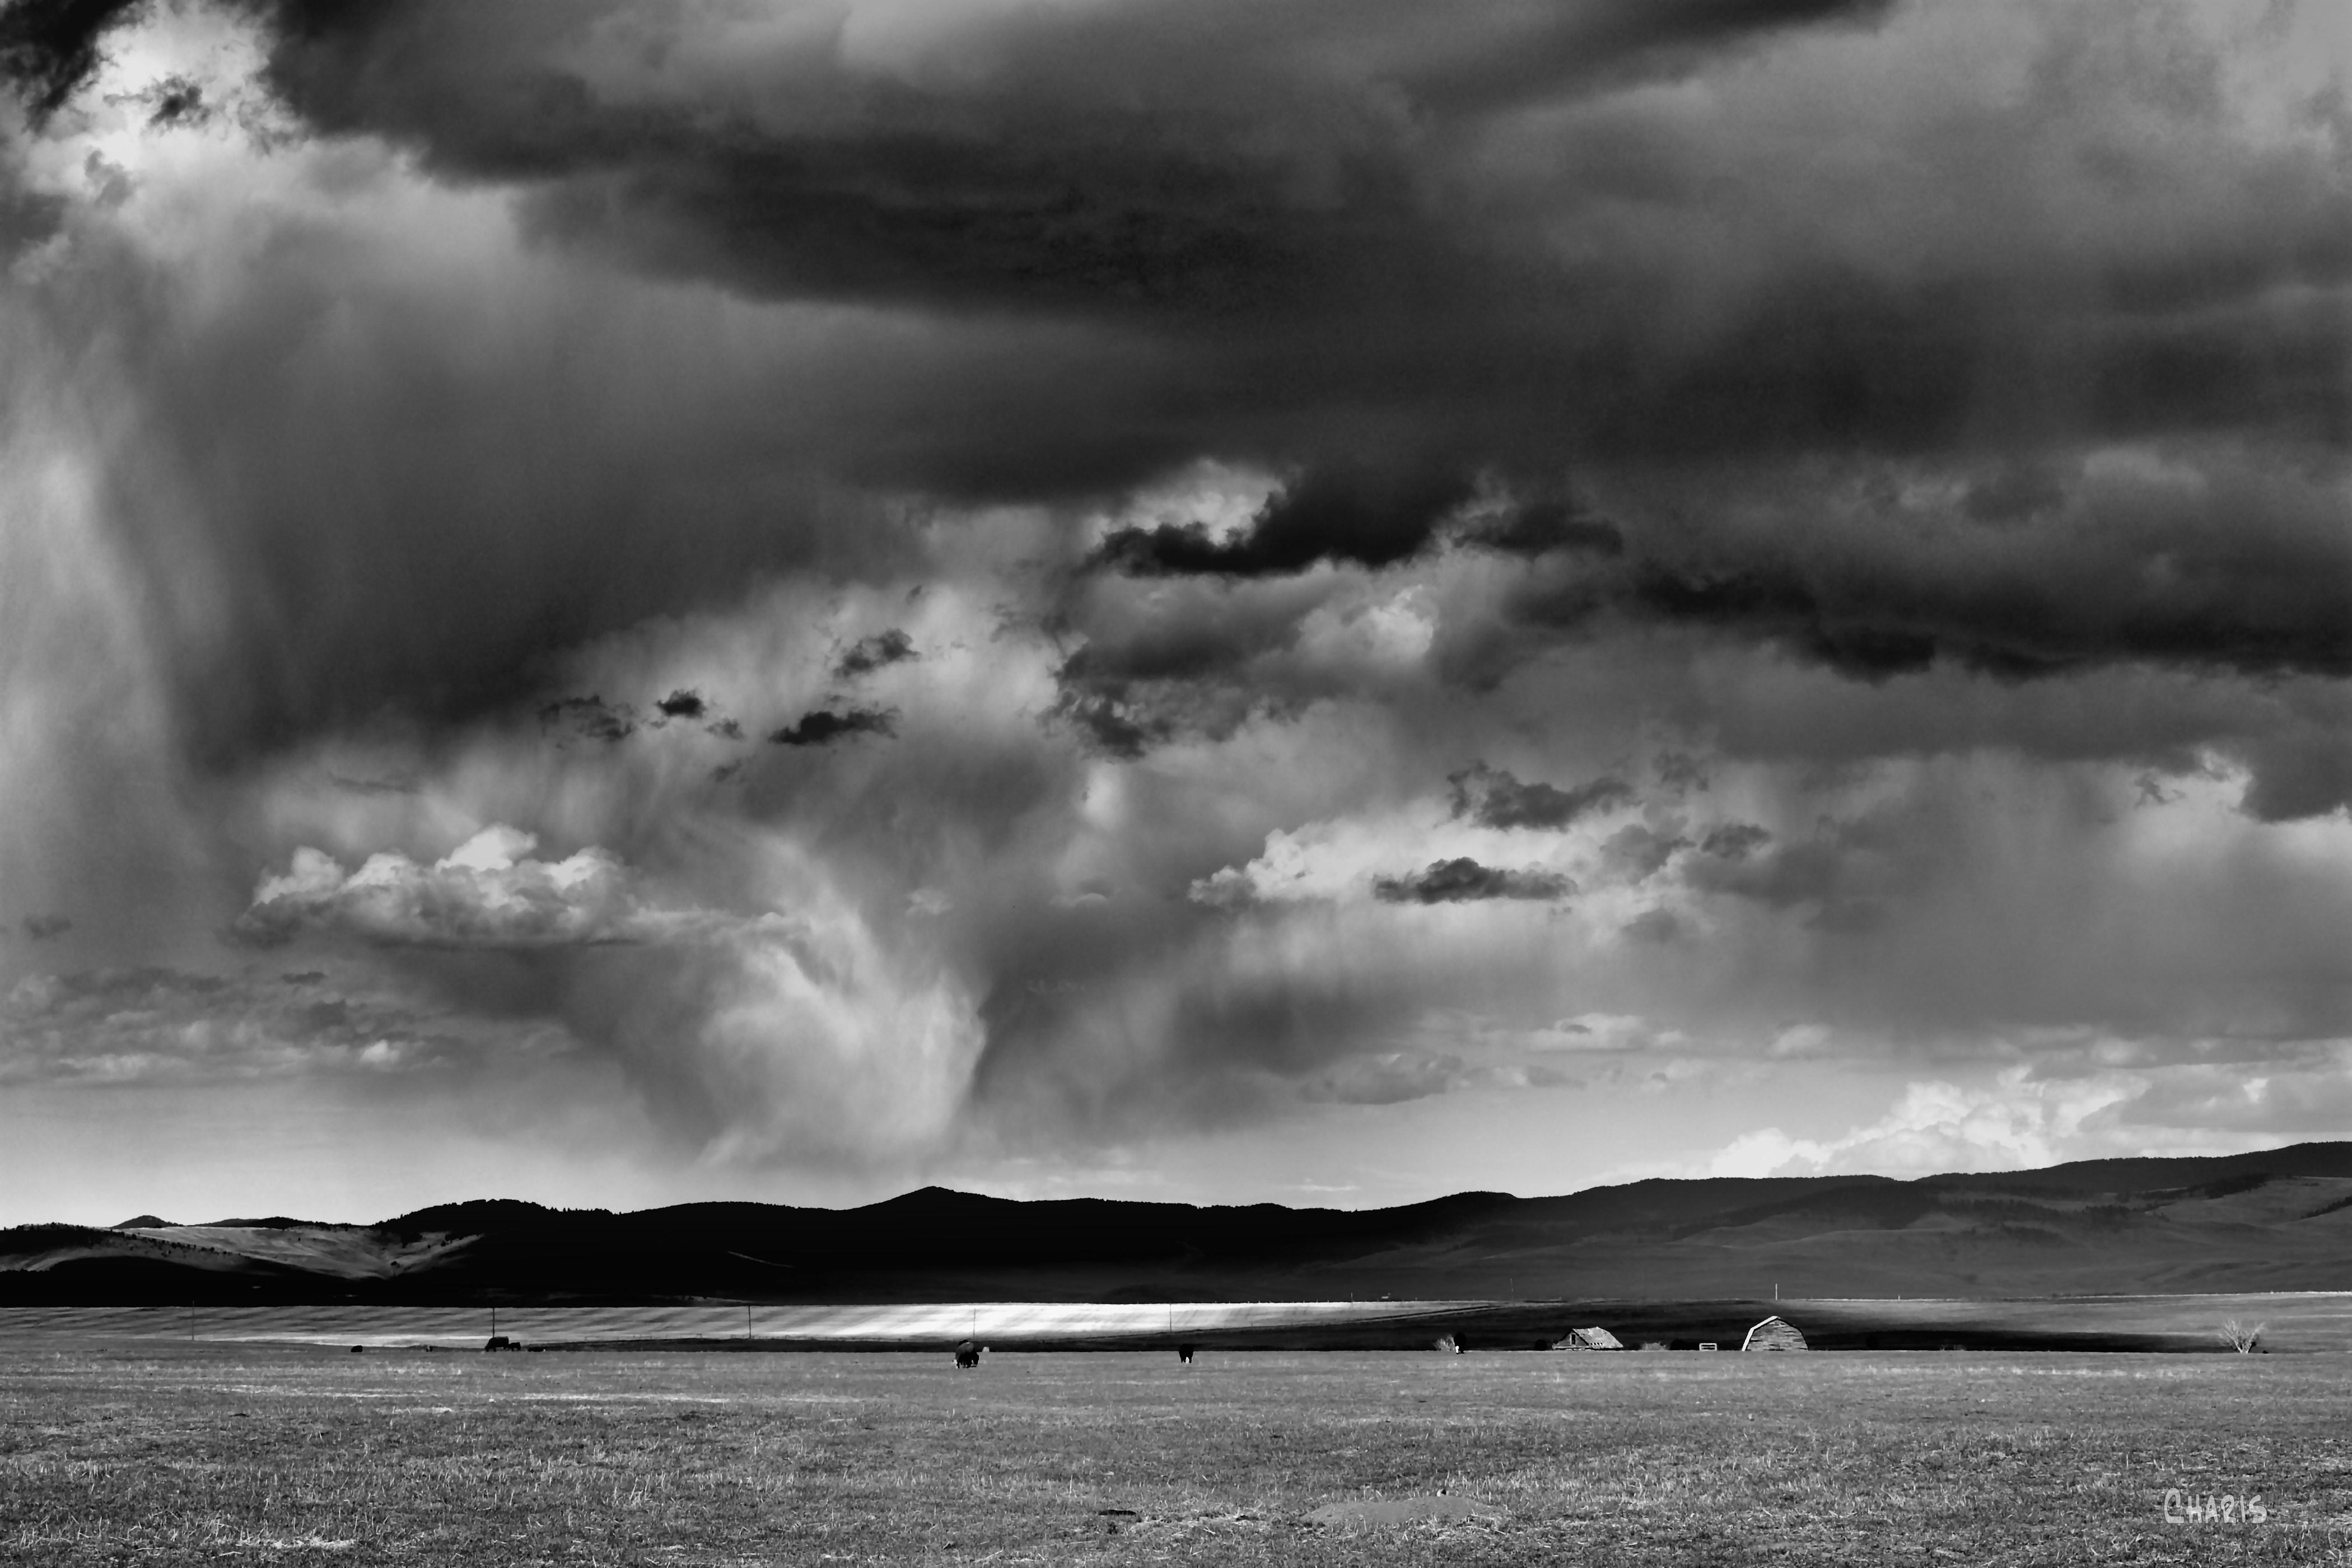 cowboy trail may 5 bw rain clouds ch rs DSC_0014